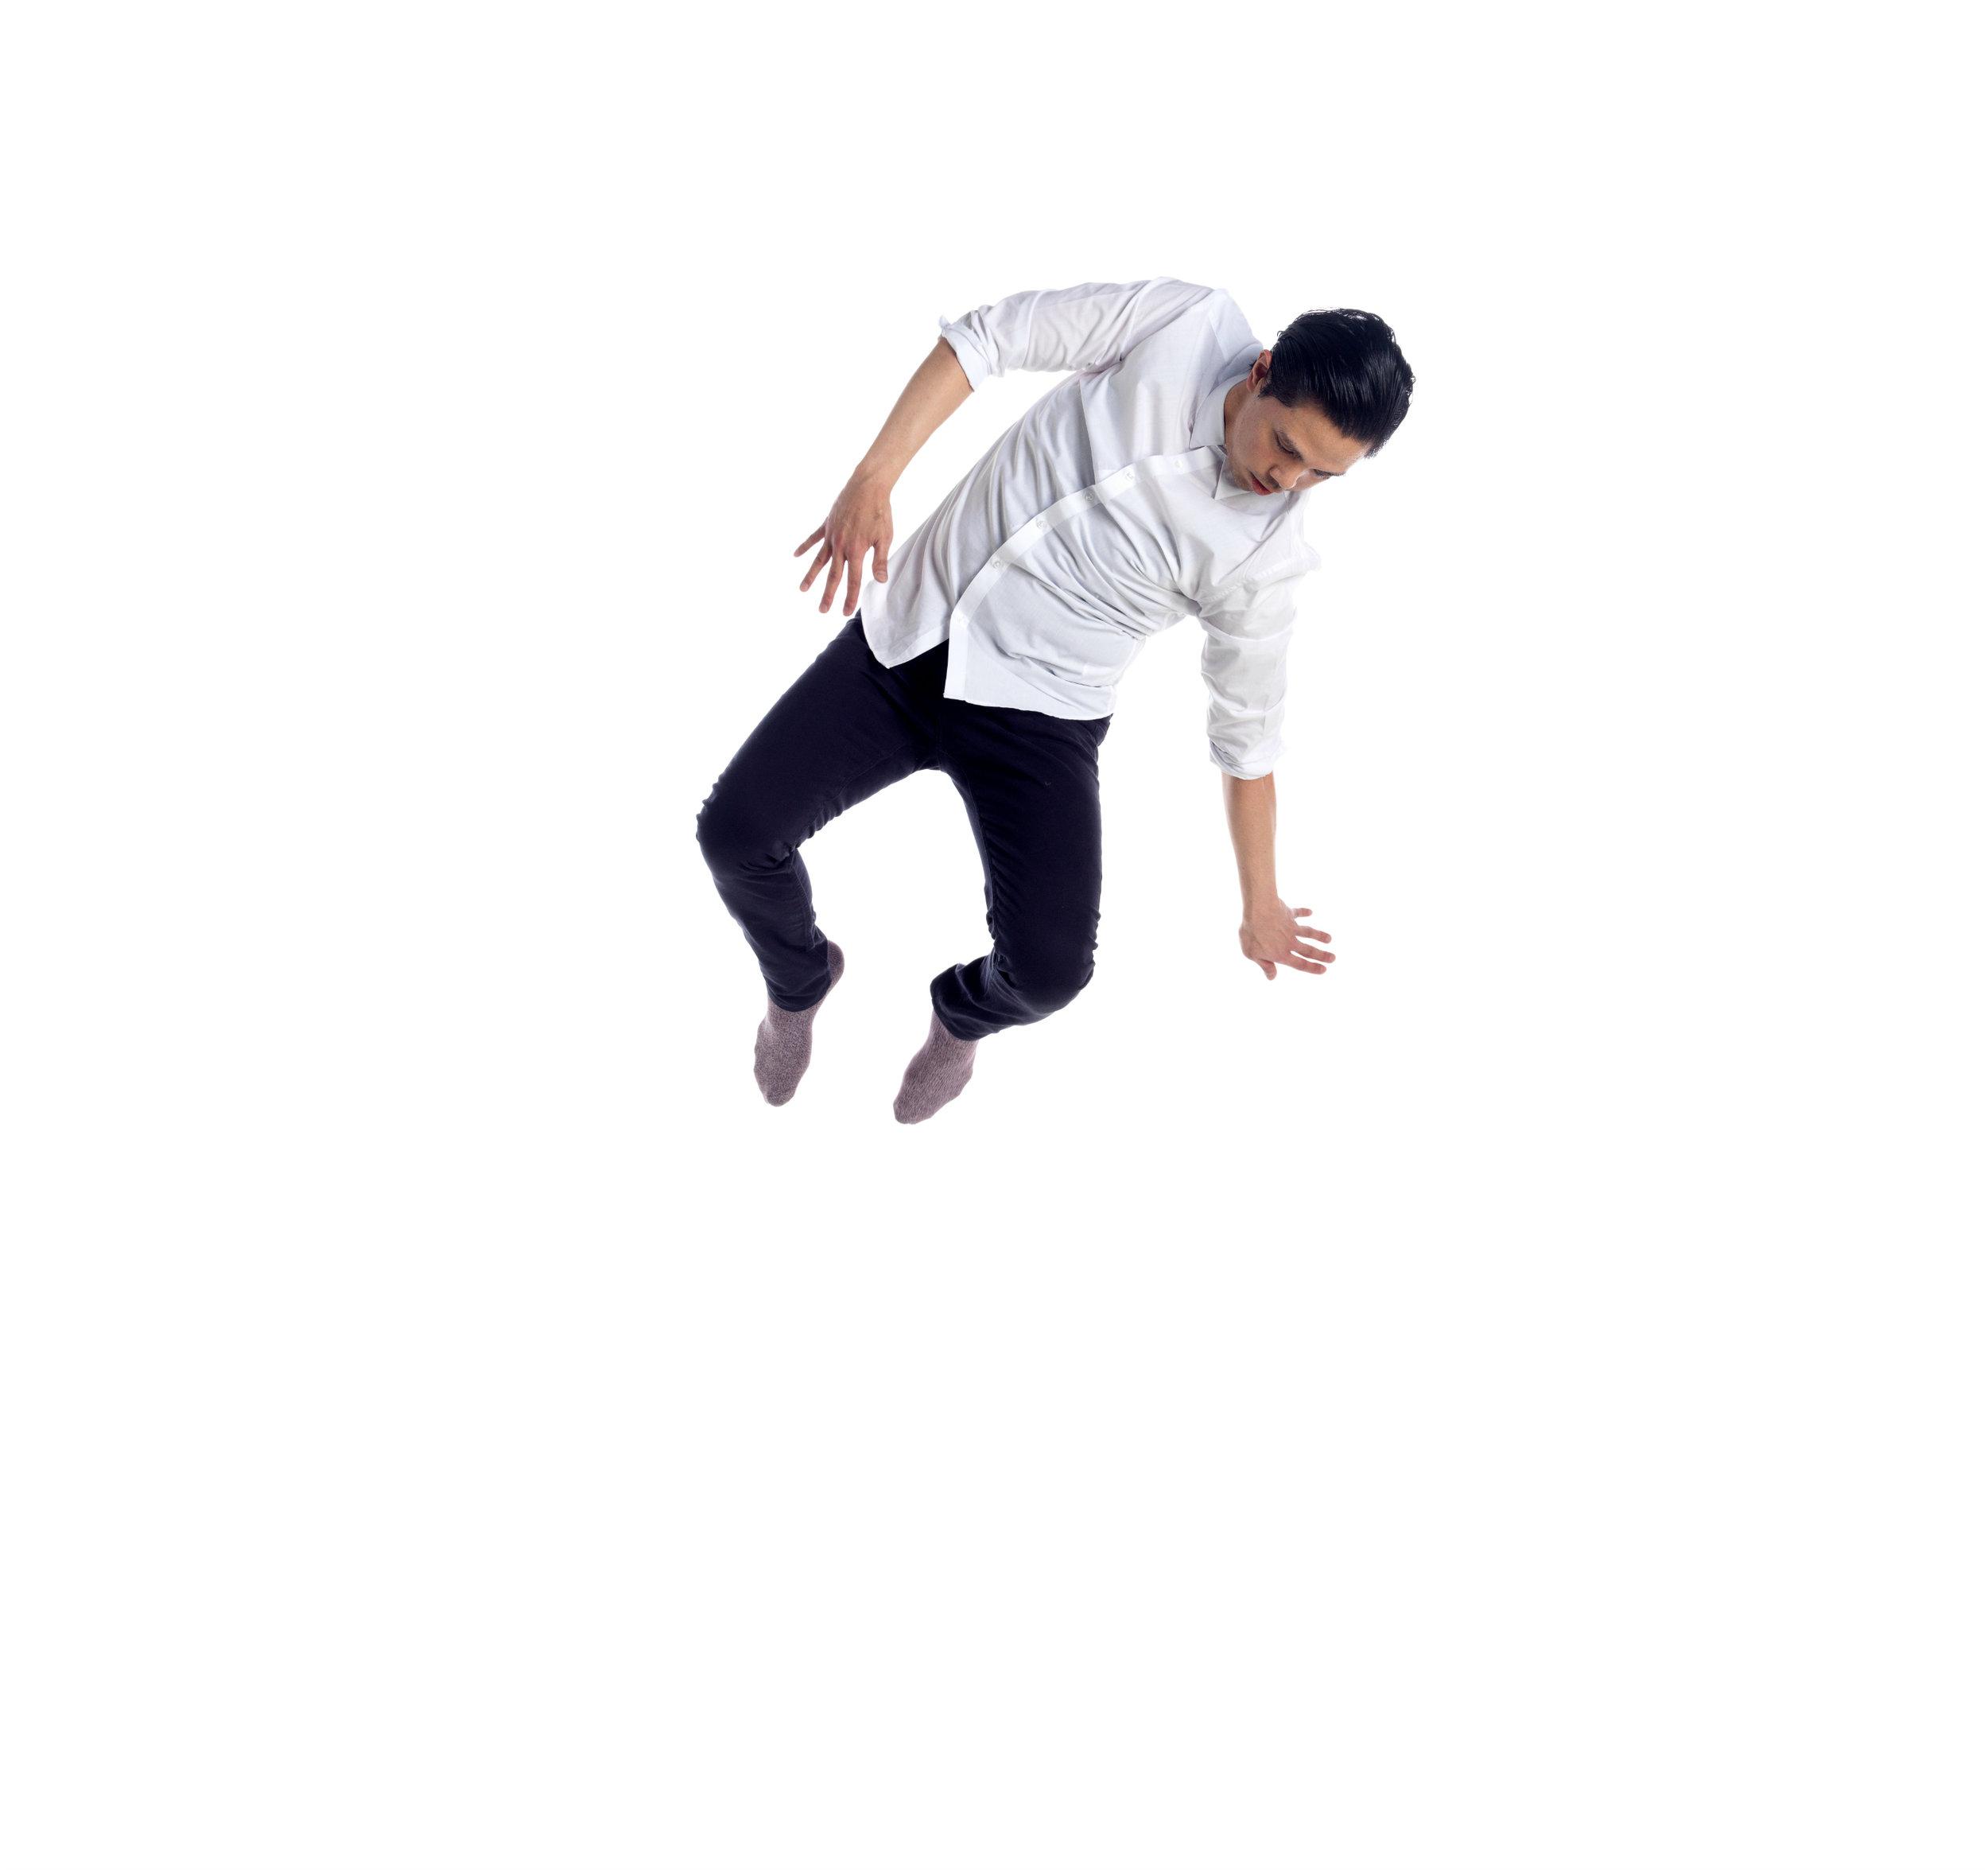 LEG UP!-marc-arboleda-up.jpg